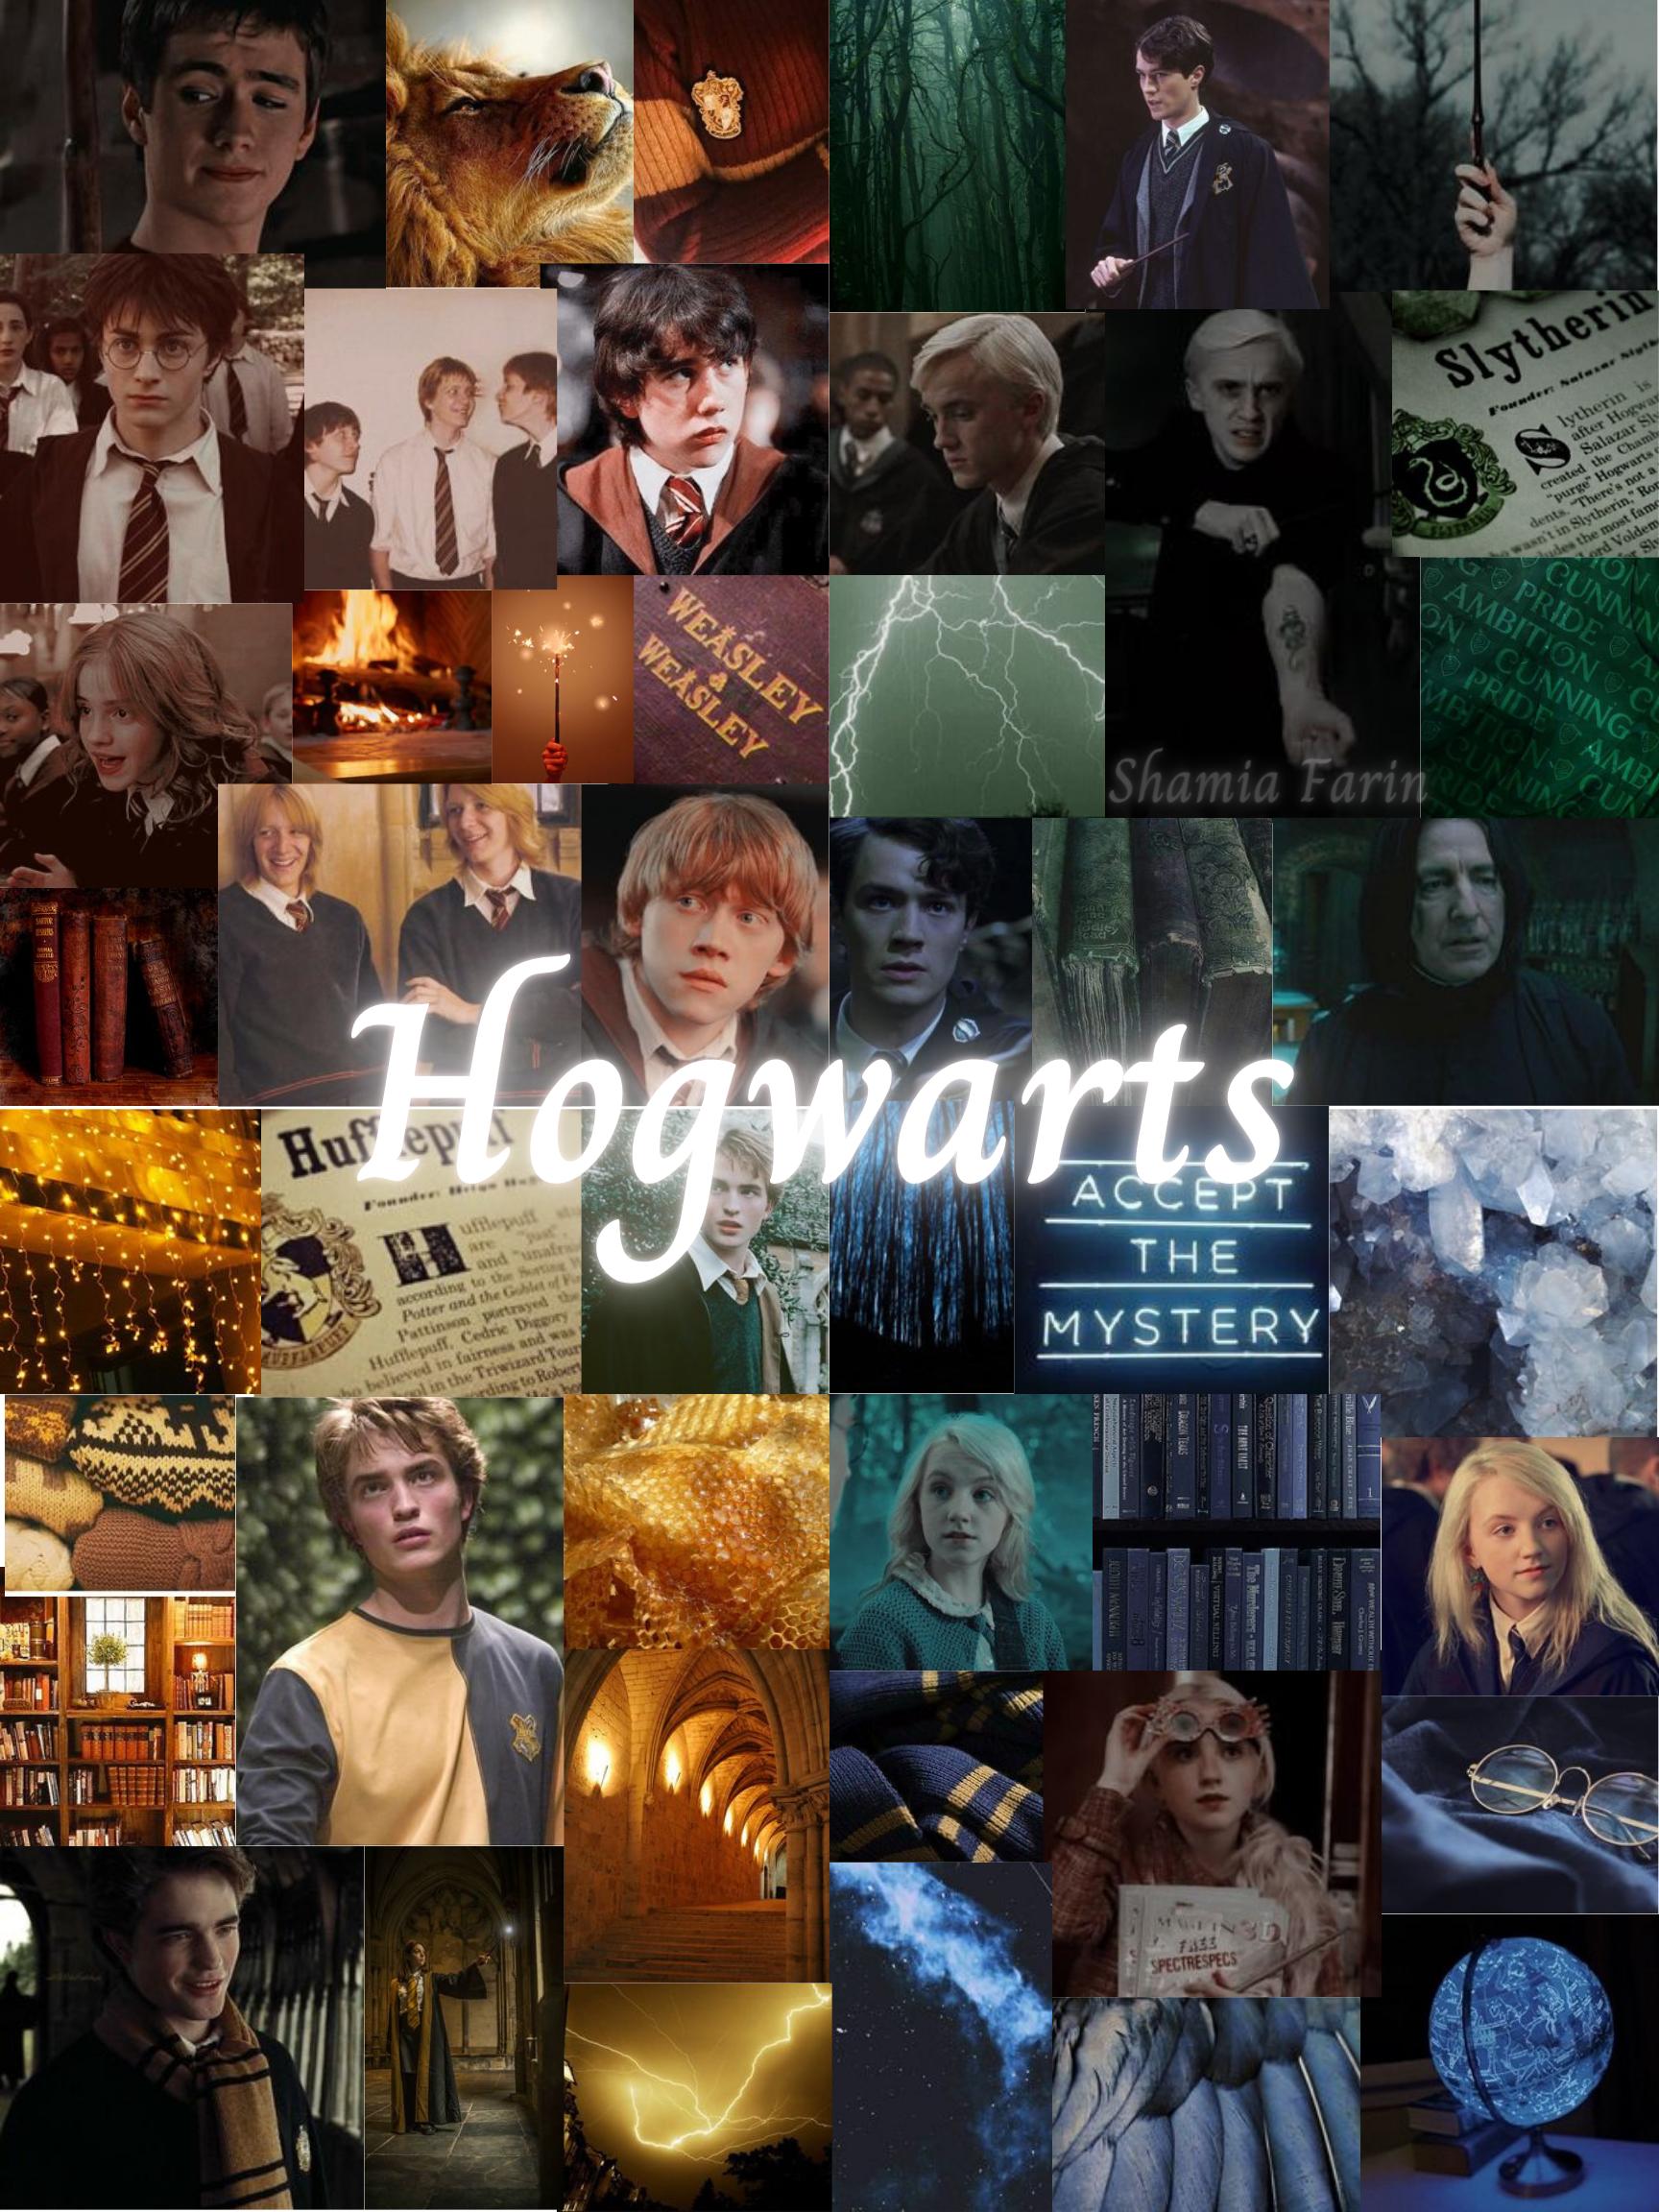 Hogwarts Wallpaper Hogwarts Gryffindor Aesthetic Ravenclaw Aesthetic